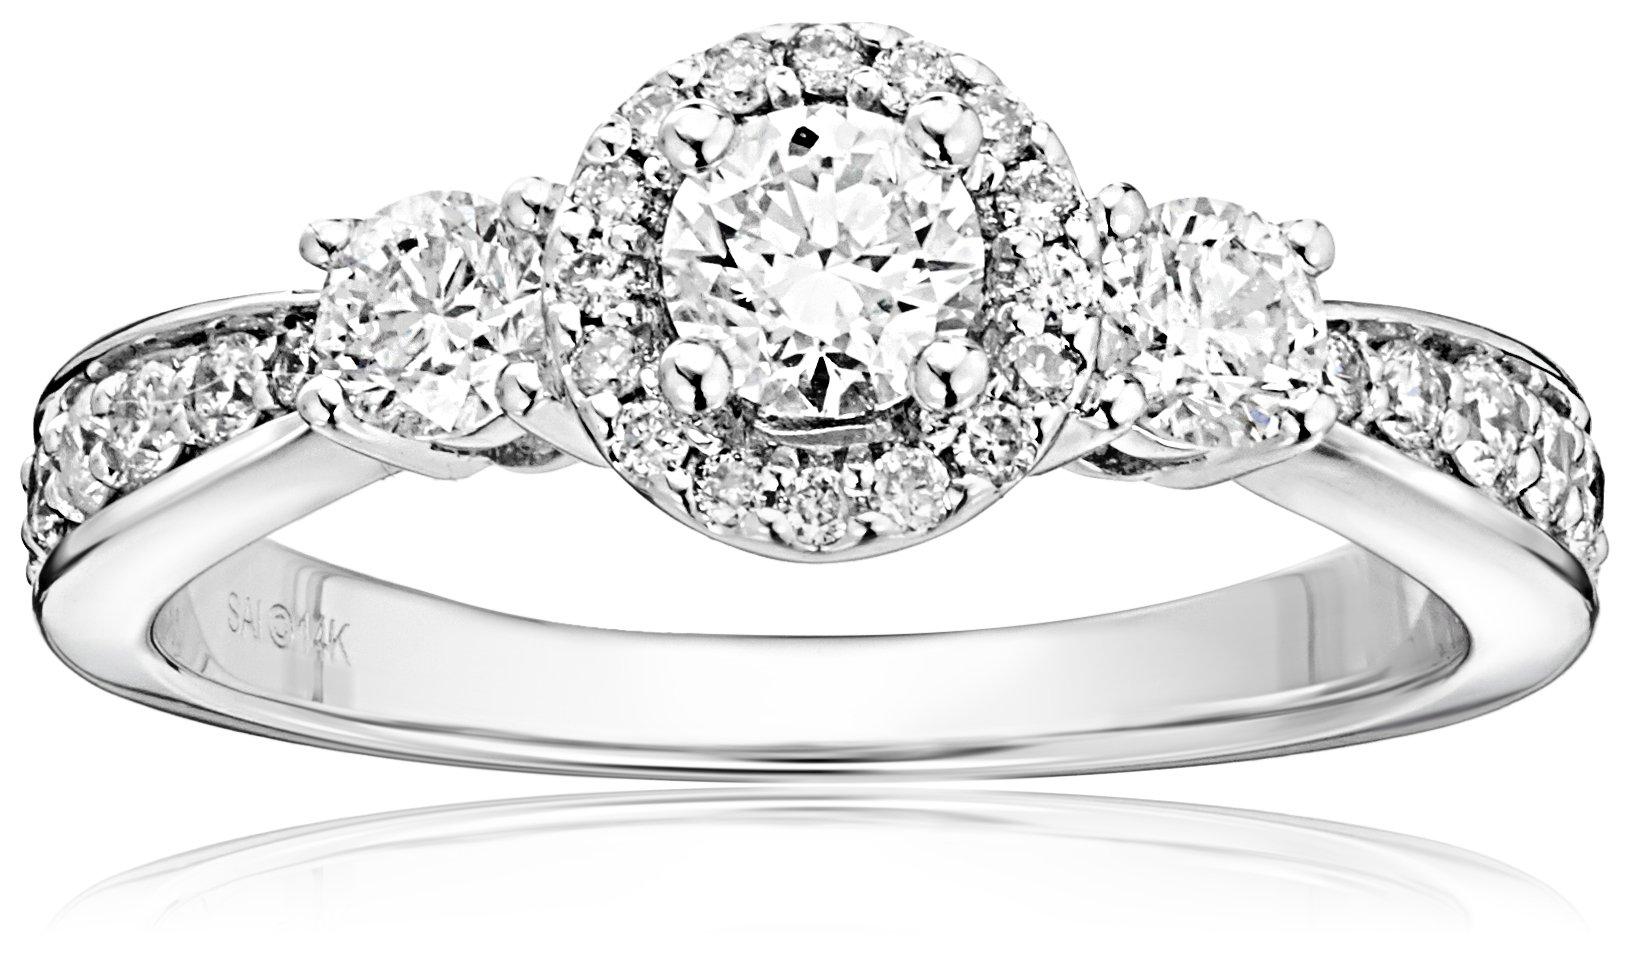 14k White Gold 1 cttw Diamond Anniversary Ring, Size 6